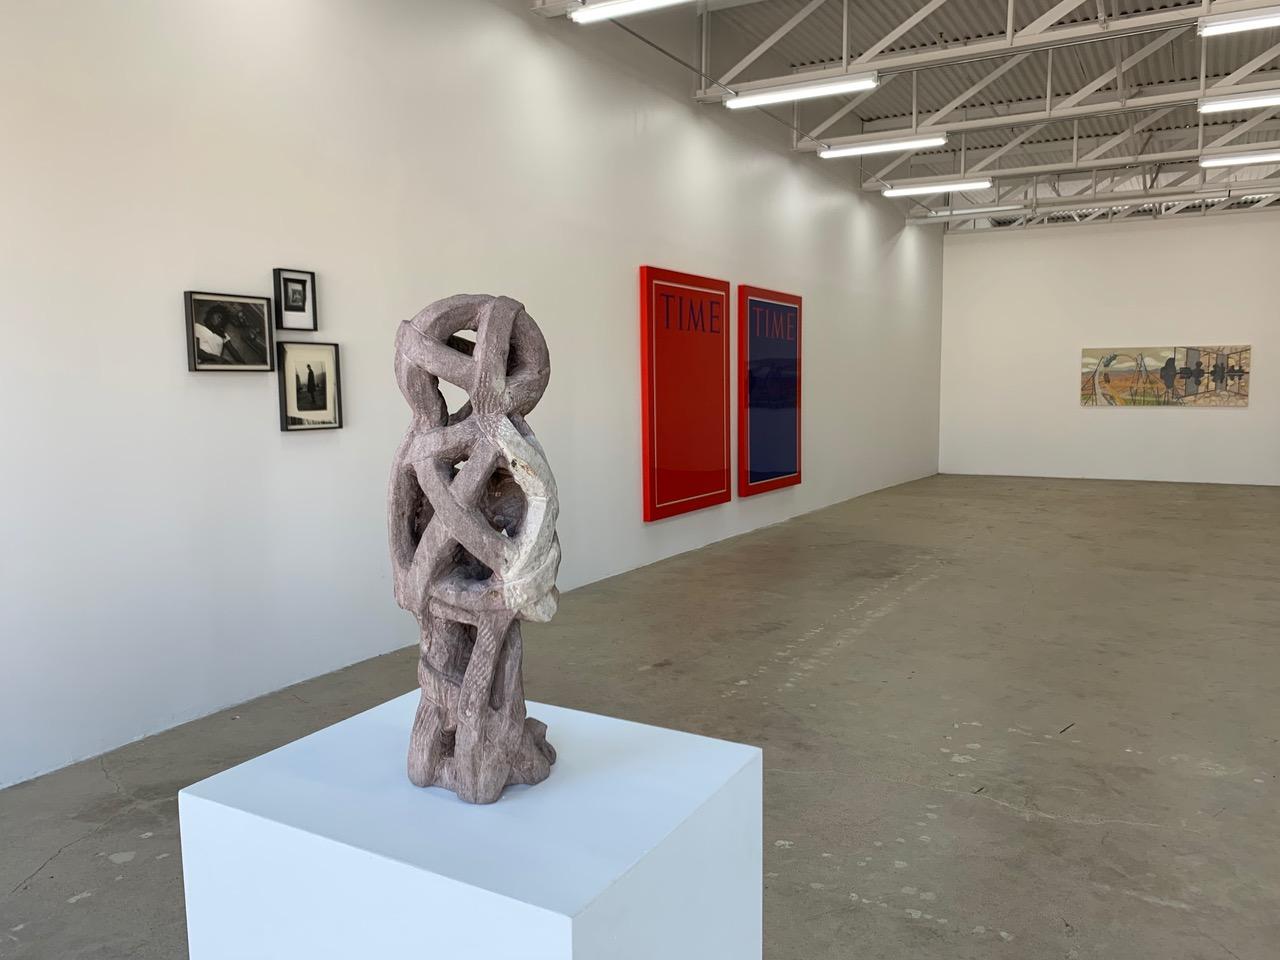 Stefan Rinck - pre sent tense | October 10, 2020 - January 9, 2021 | galerie frank elbaz | Dallas, Texas